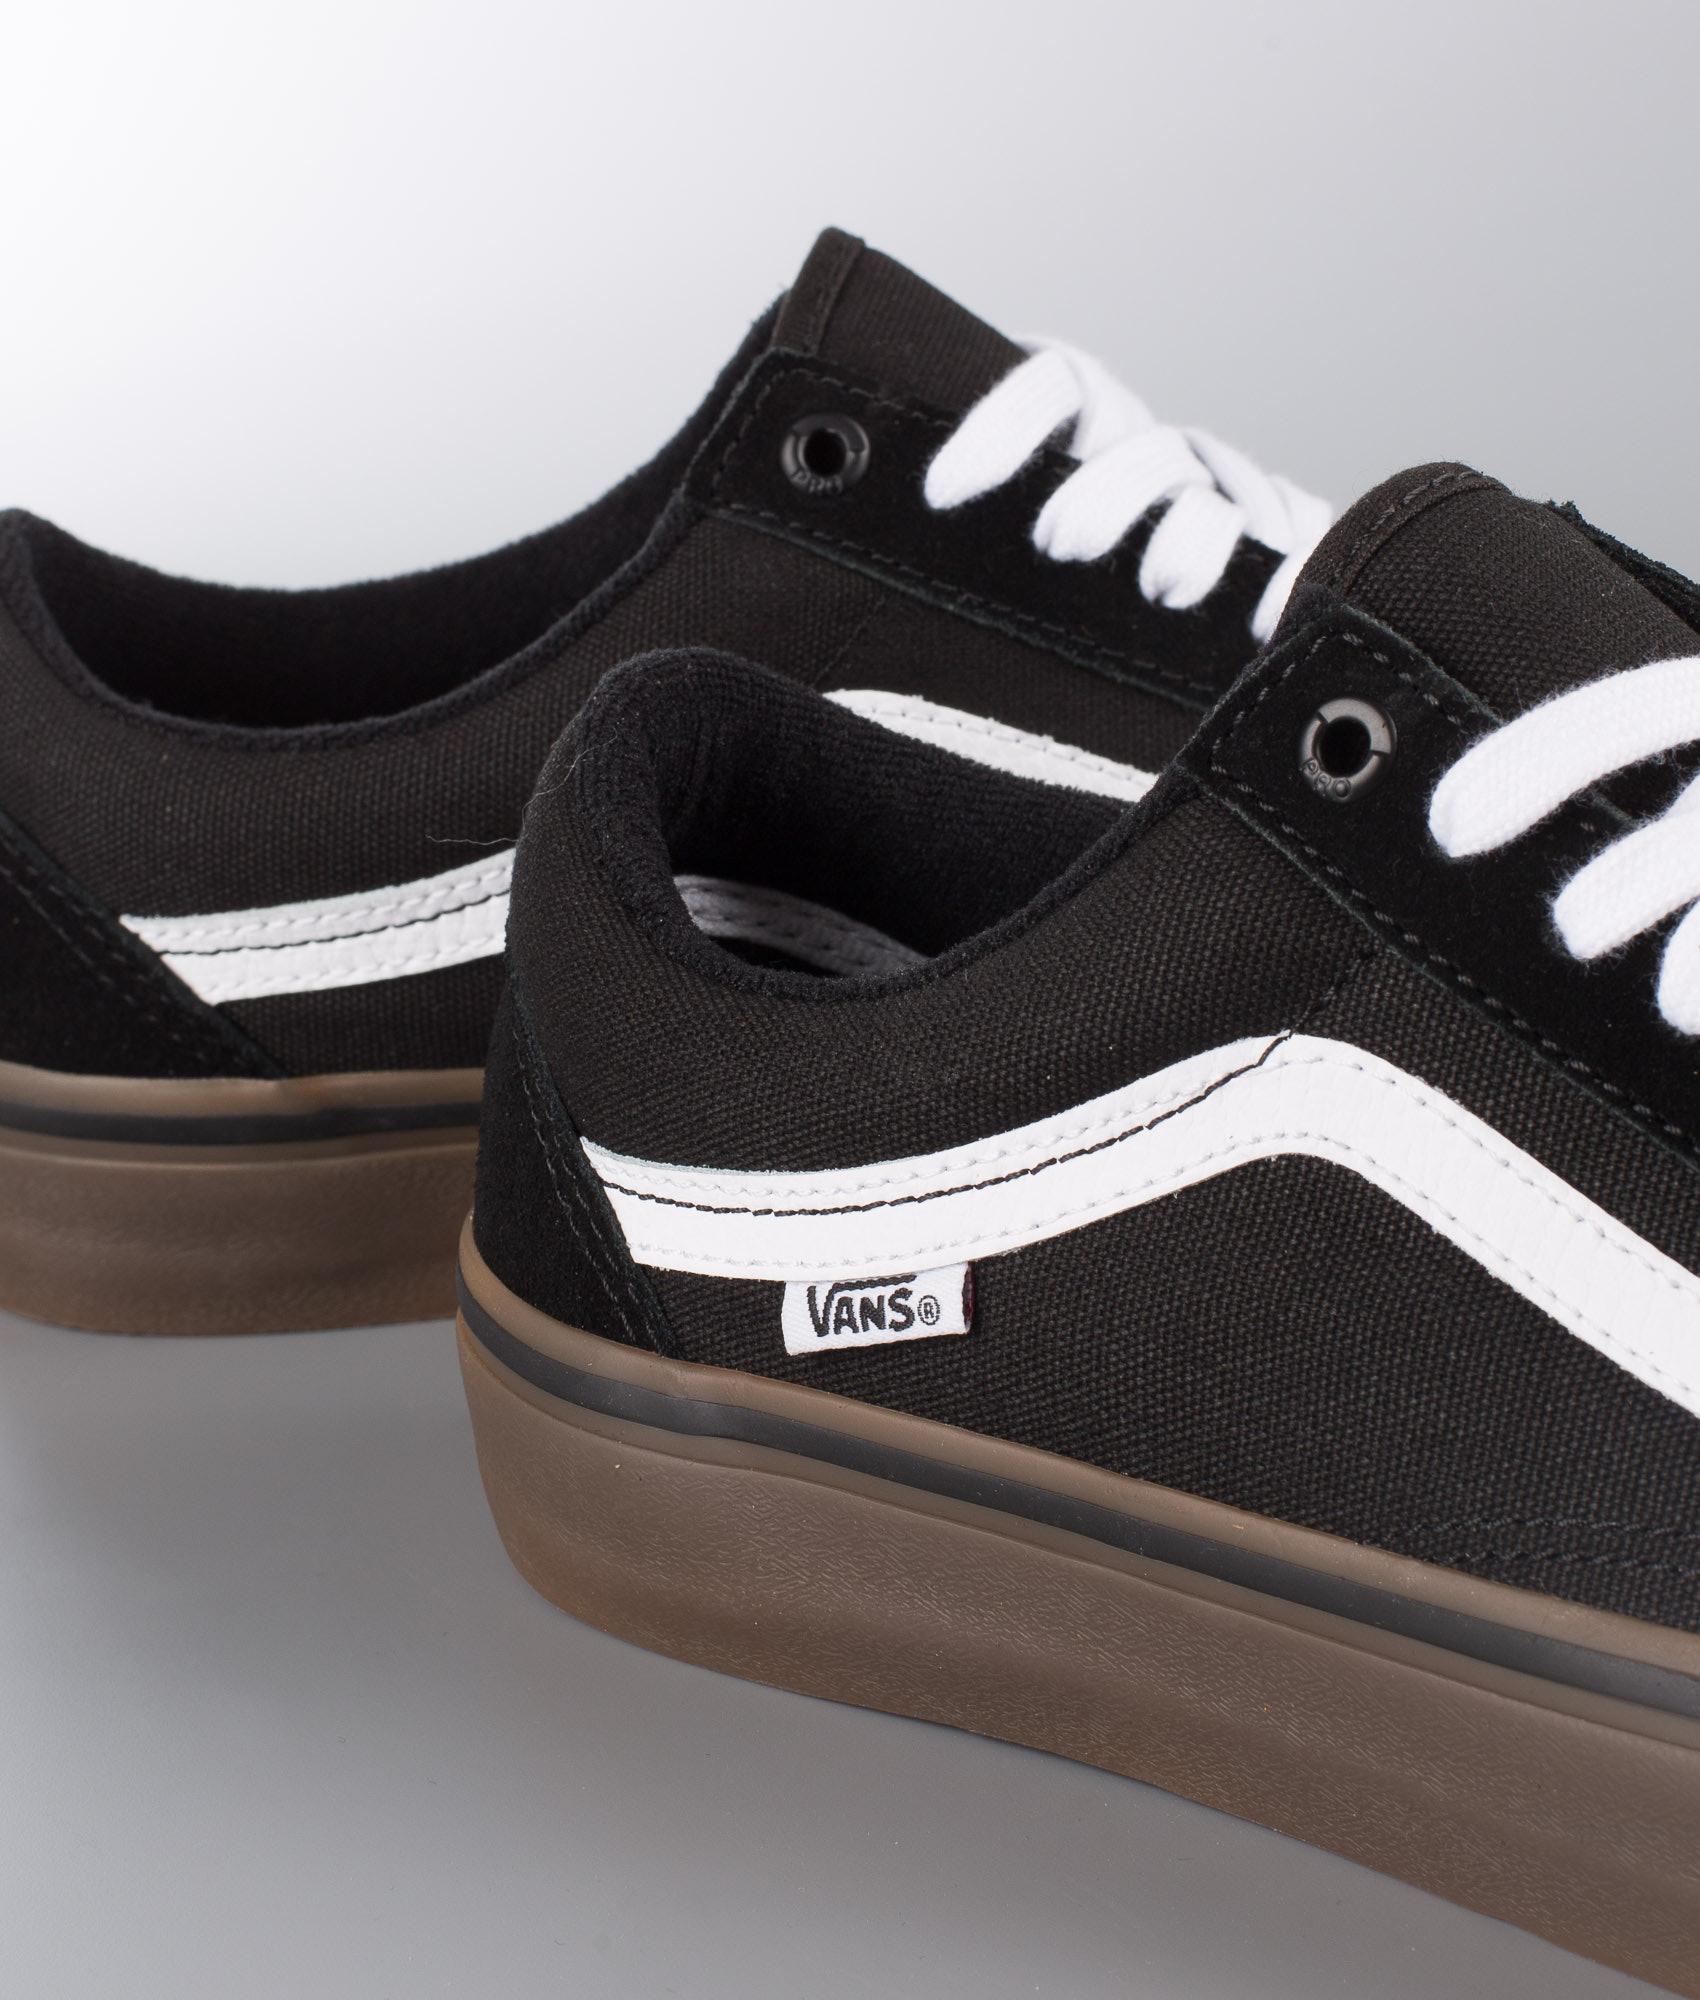 e2b5f00769b Vans Old Skool Pro Shoes Black White Medium Gum - Ridestore.com